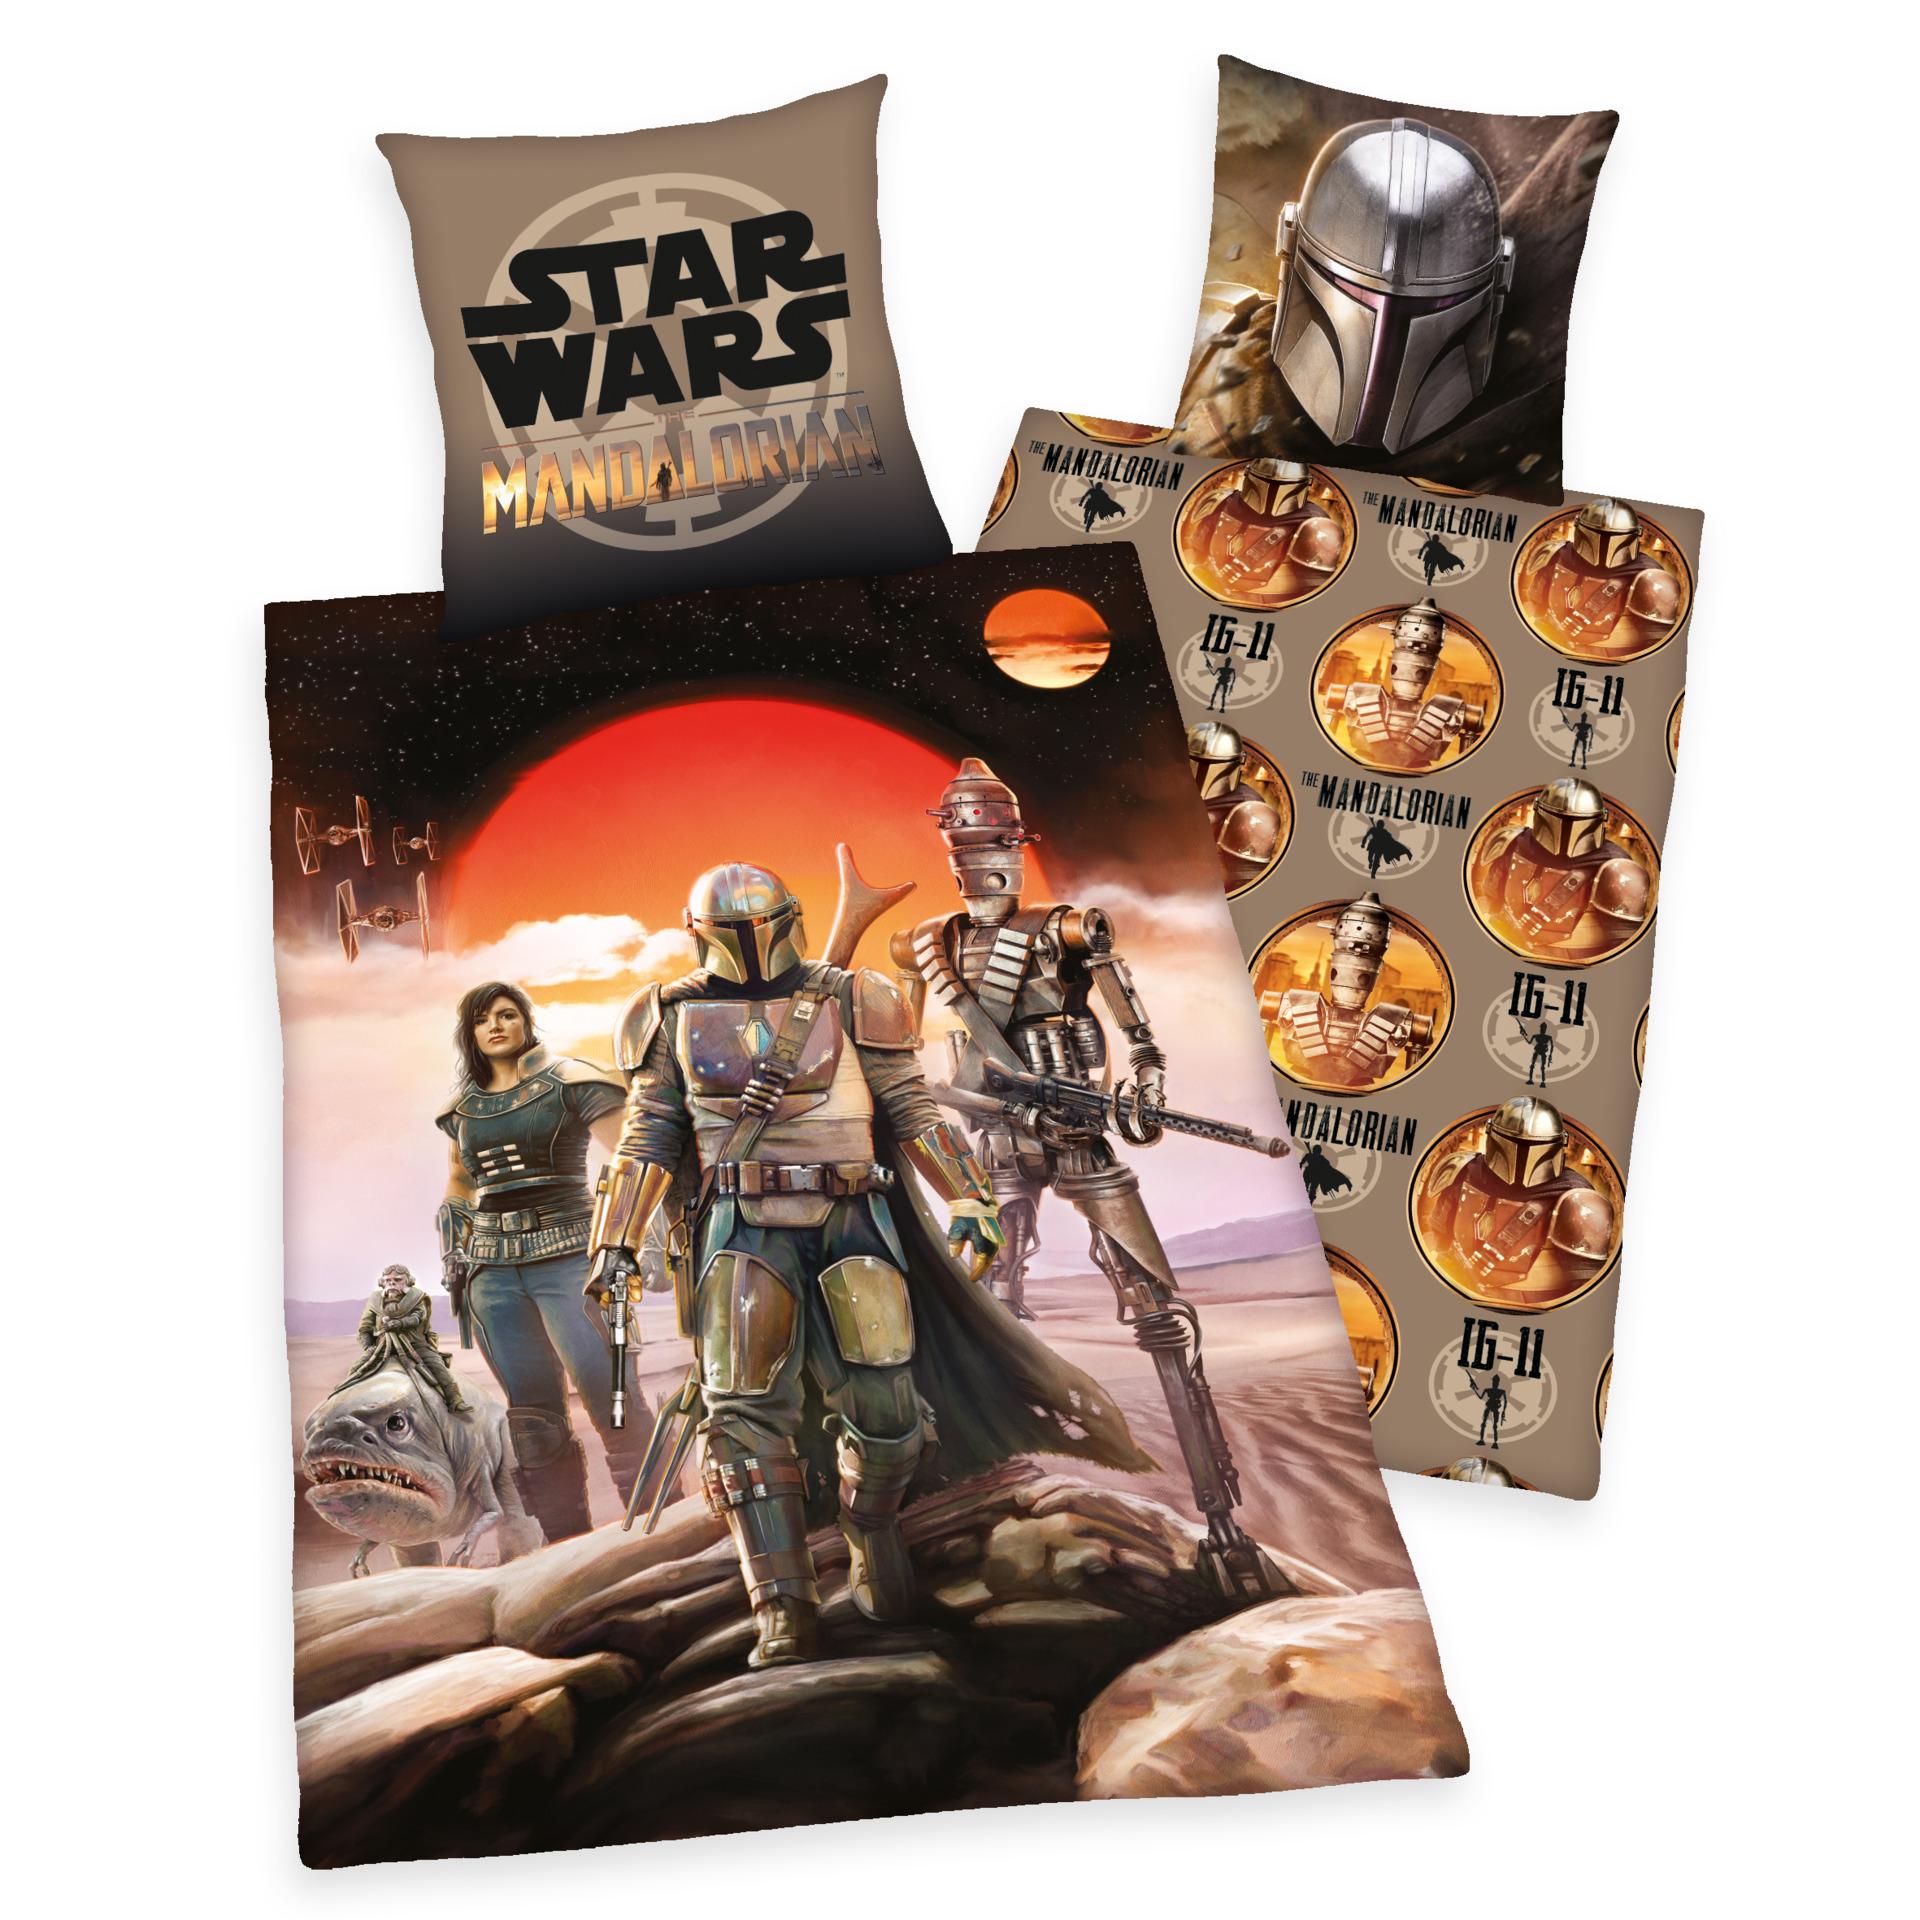 Obliečky Star Wars: The Mandalorian - Mandalorian